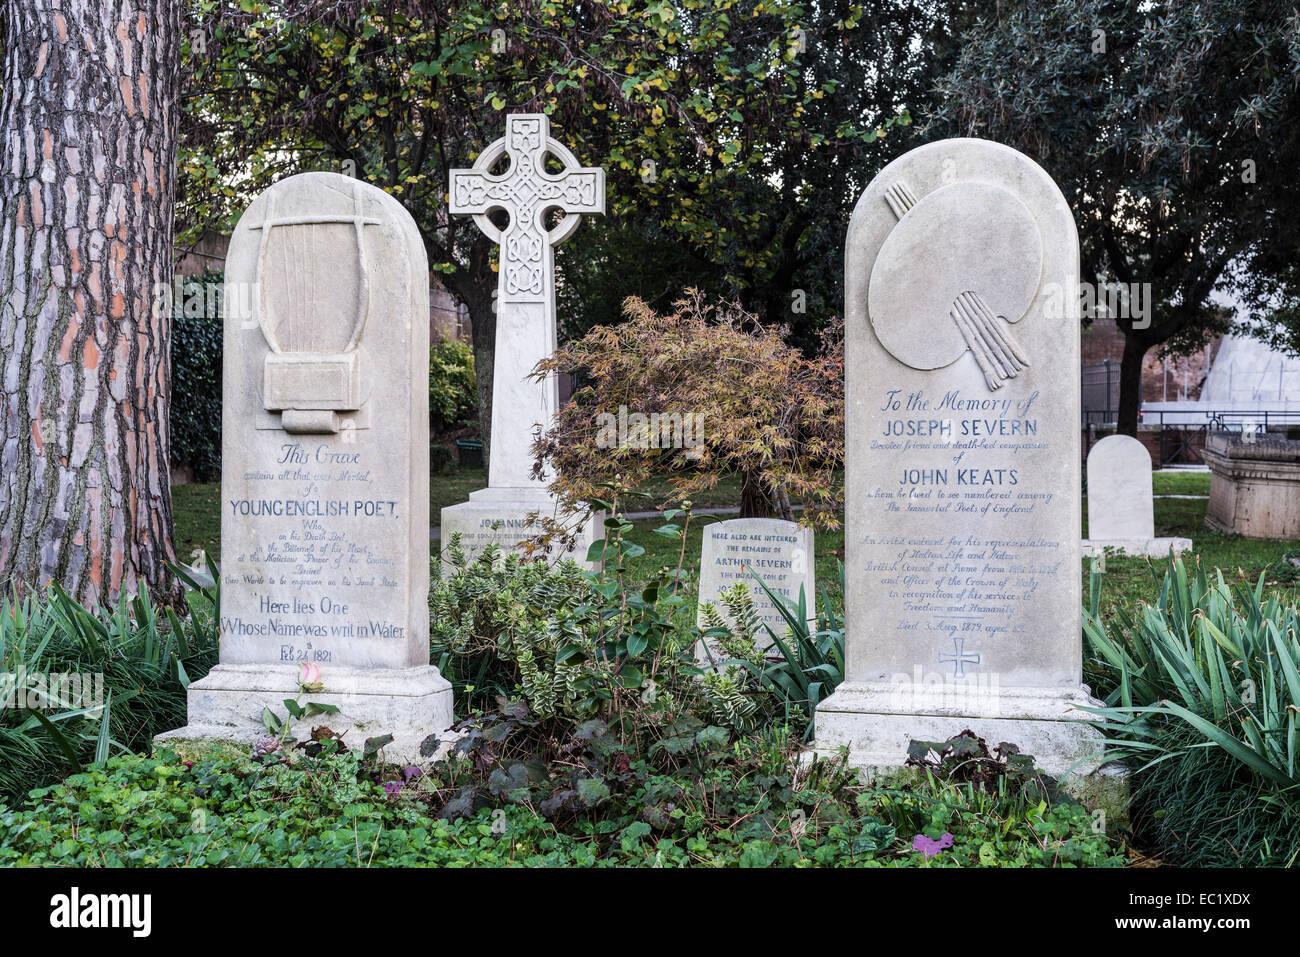 Grave, John Keats, a poet of the English Romanticism, on the right the grave of Joseph Severn, English painter - Stock Image